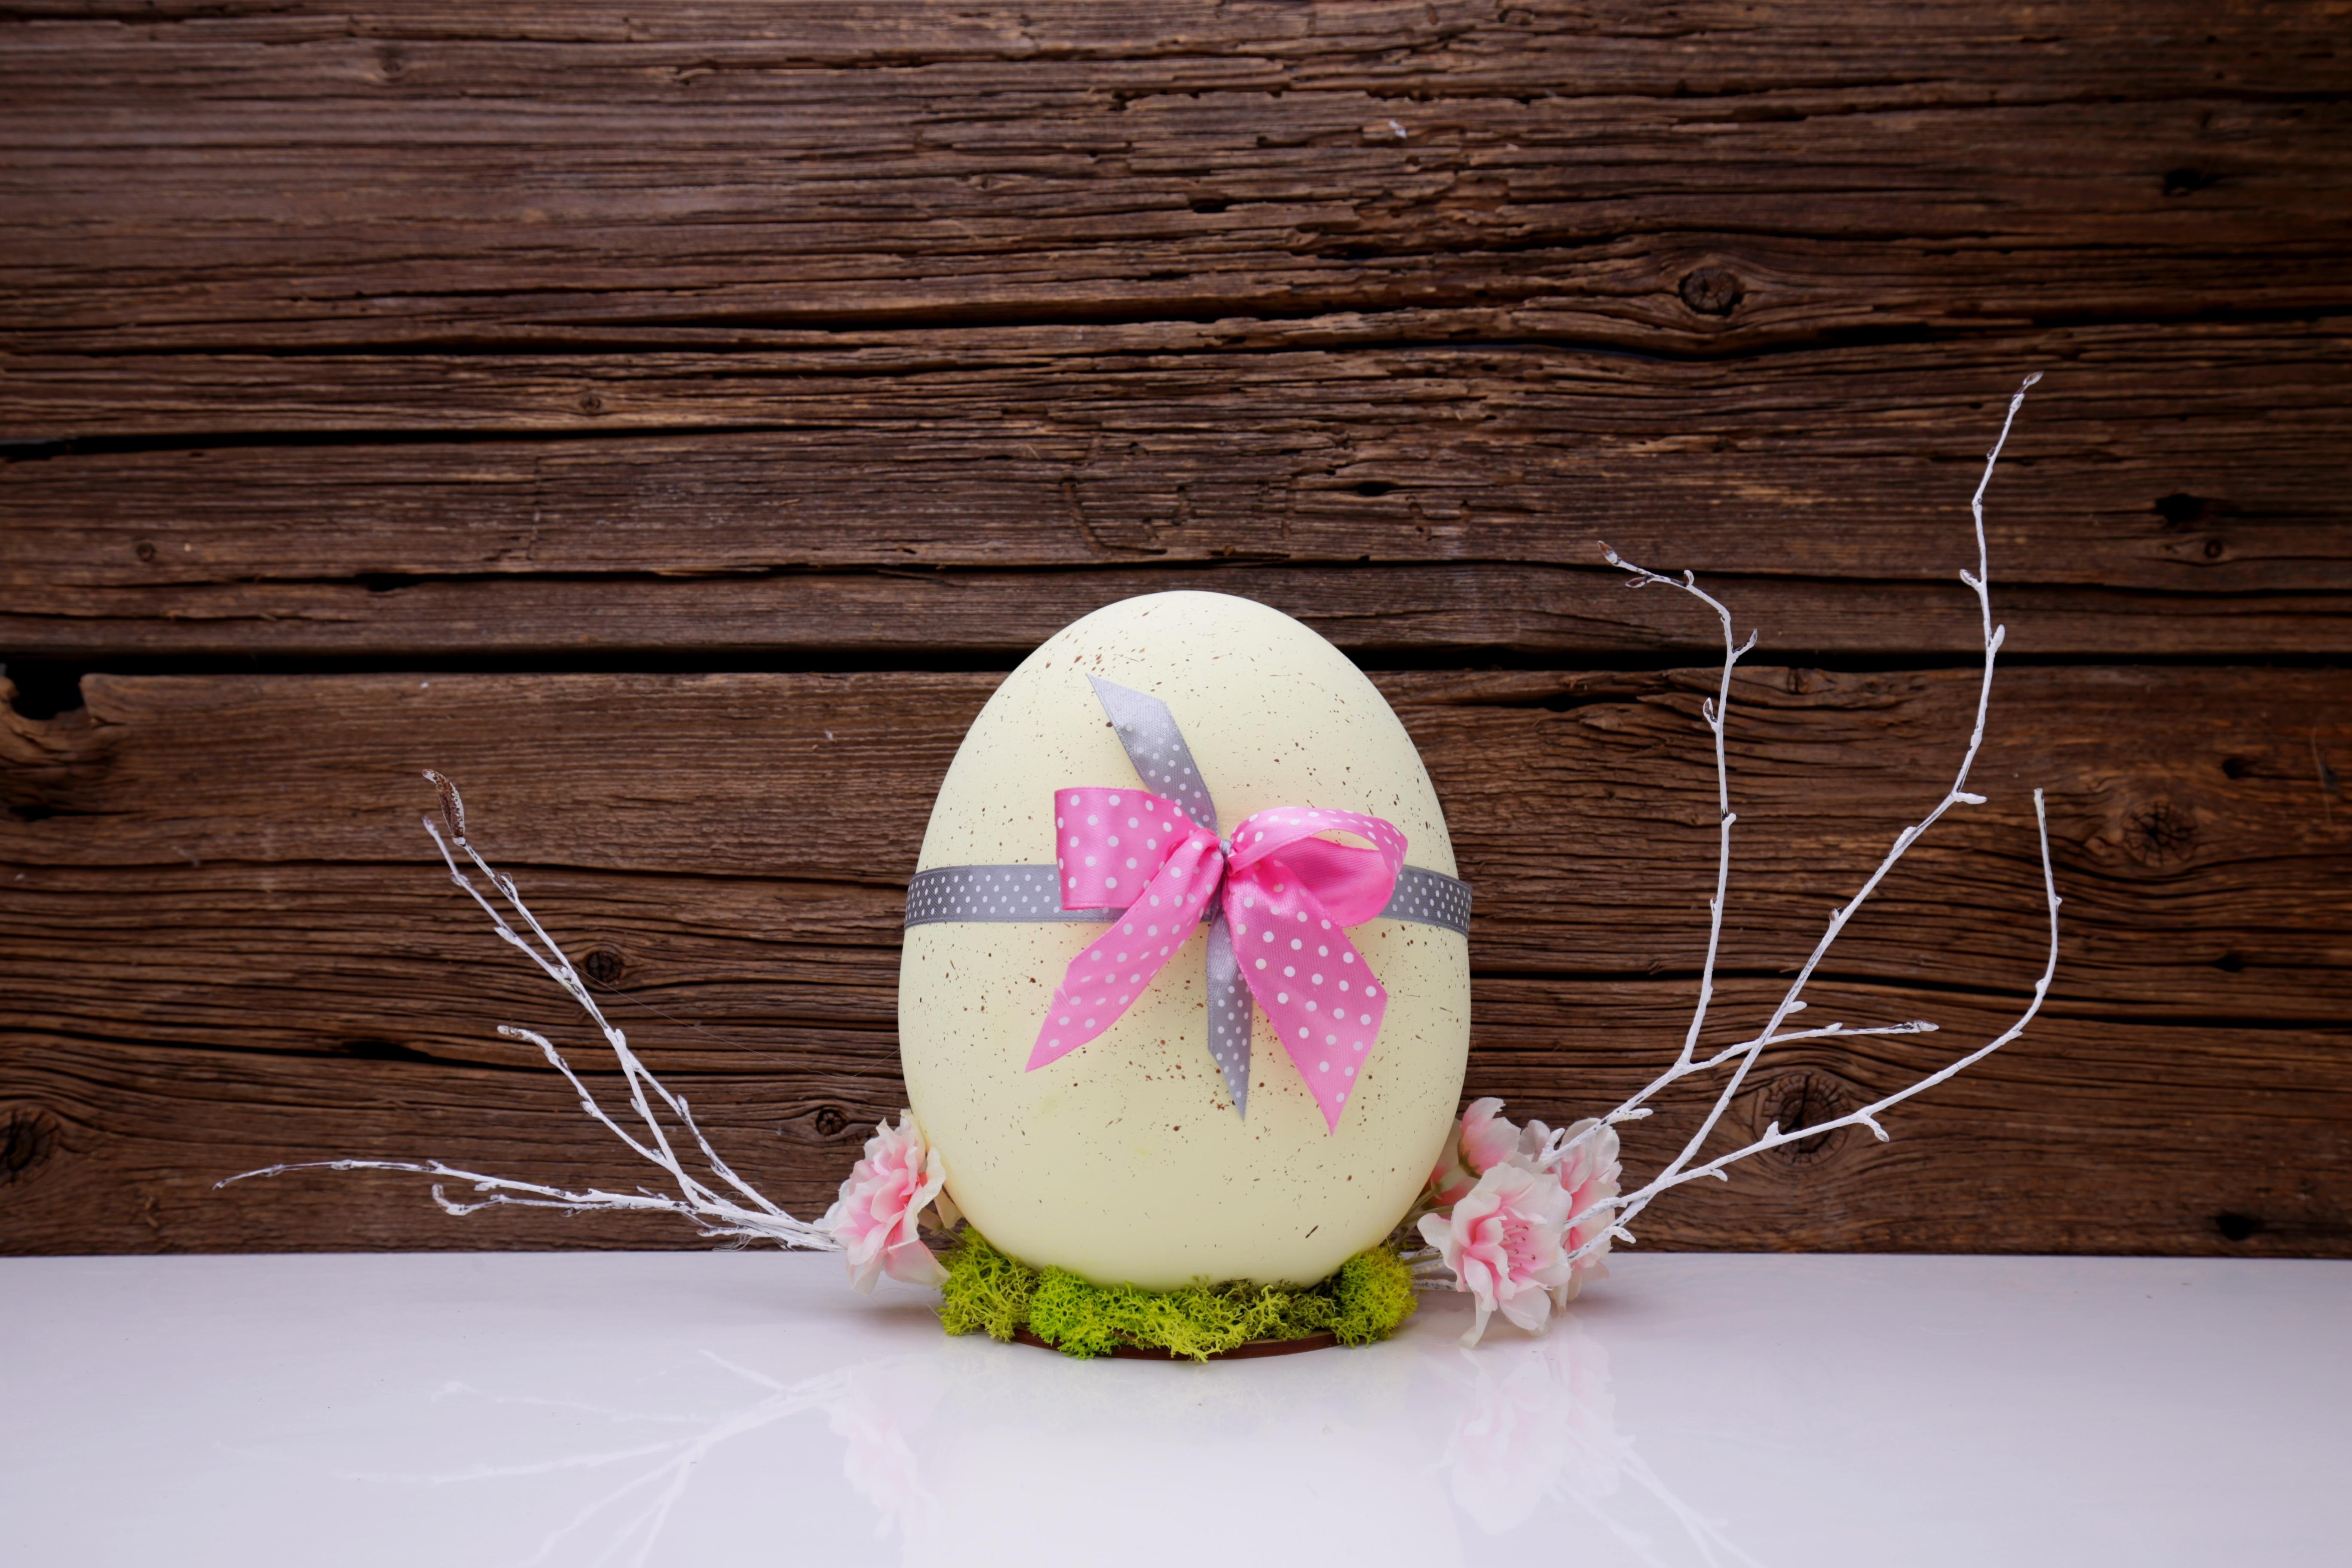 Flower Decoration Food Spring Pink Lighting Egg Painting Christmas  Decoration Art Holidays Eggs Easter Custom Easter